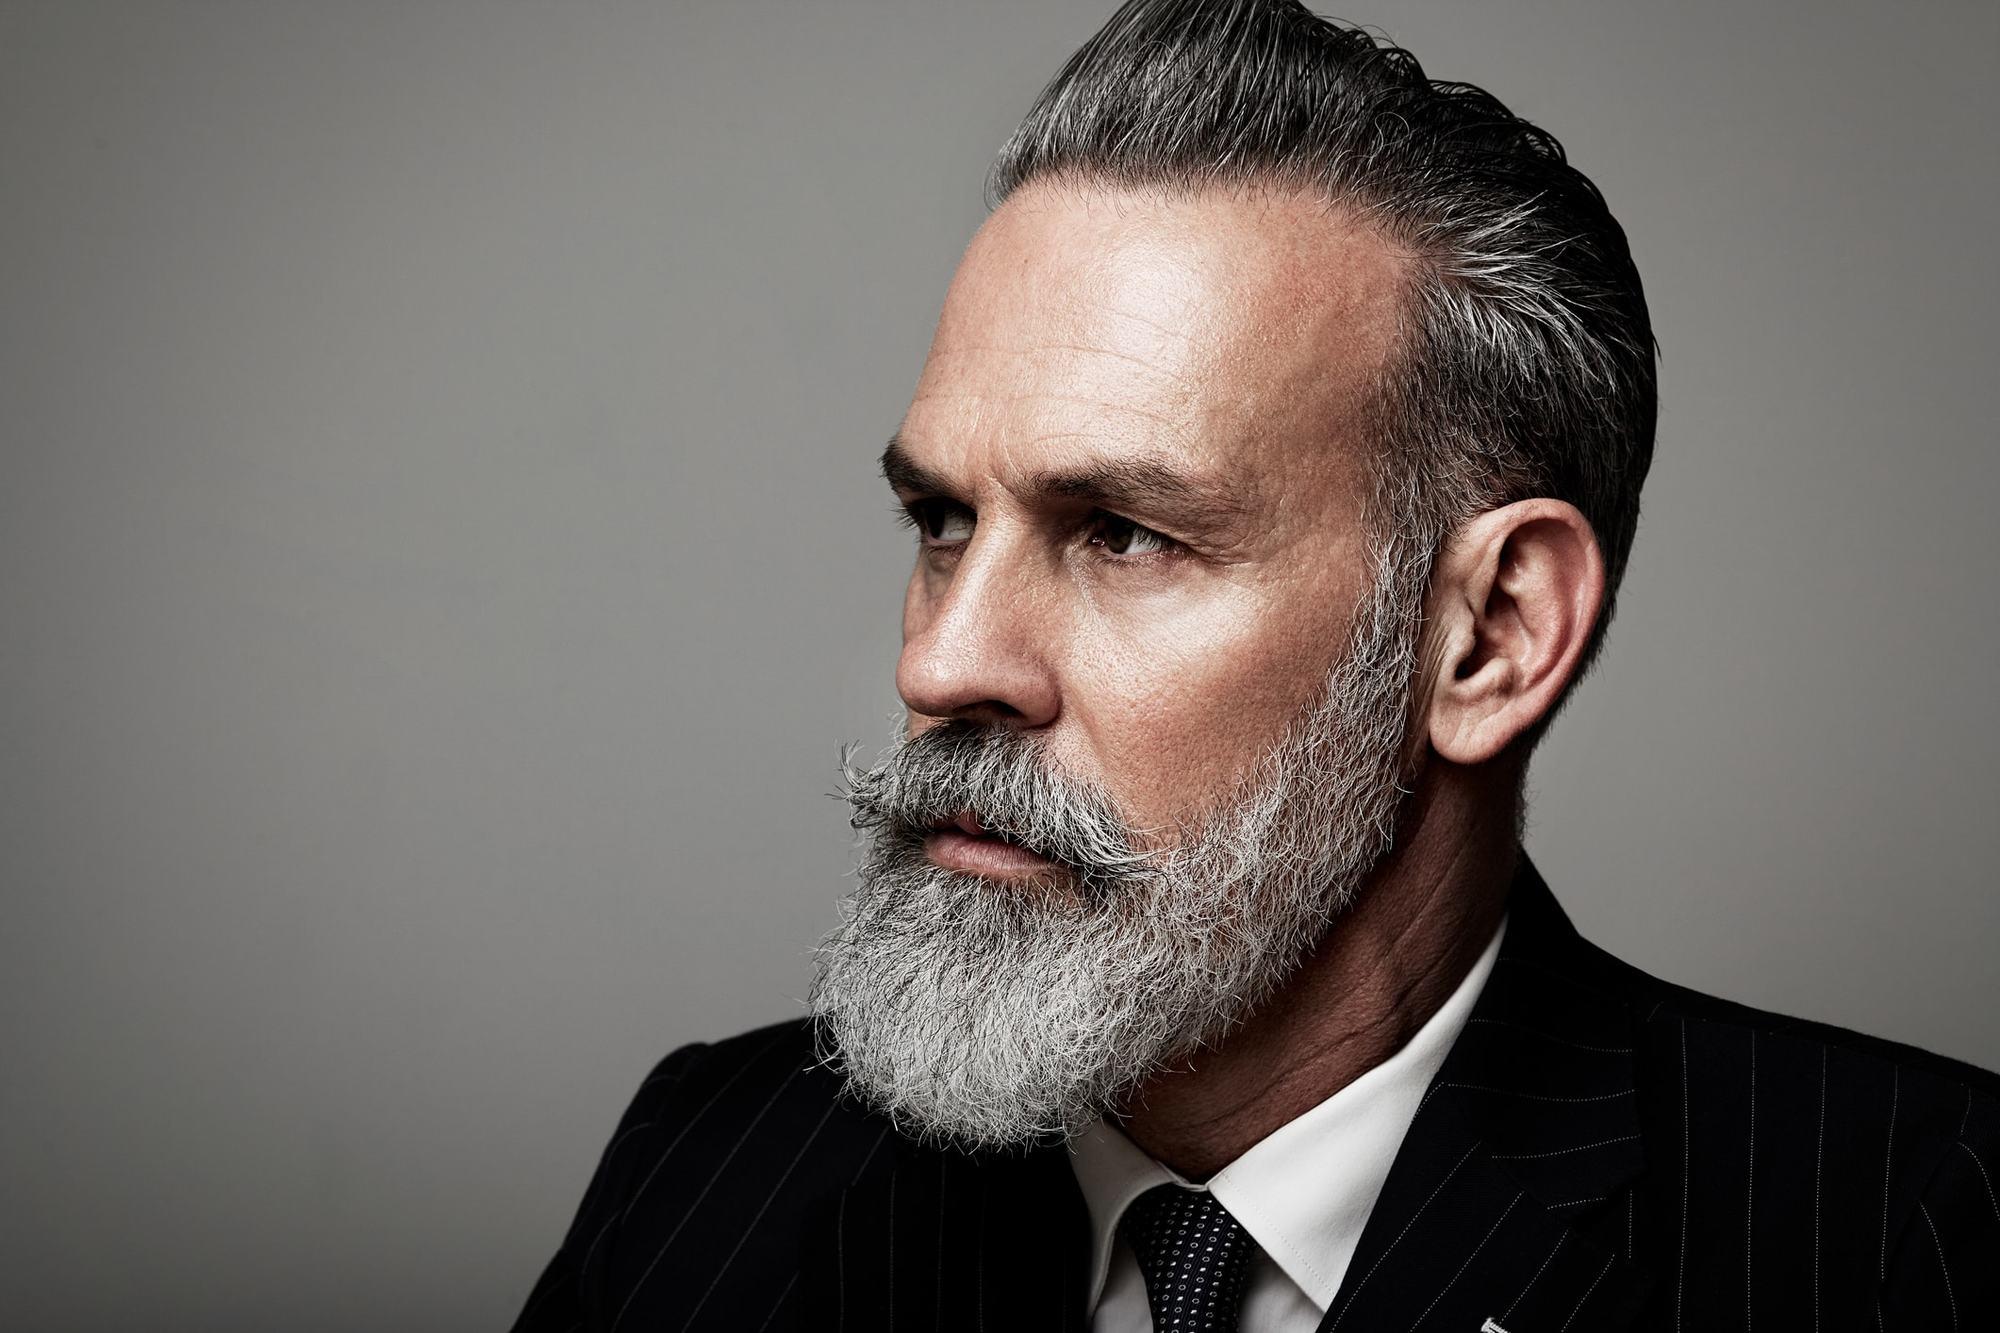 hairstyles for men over 50 styled beard hair gel